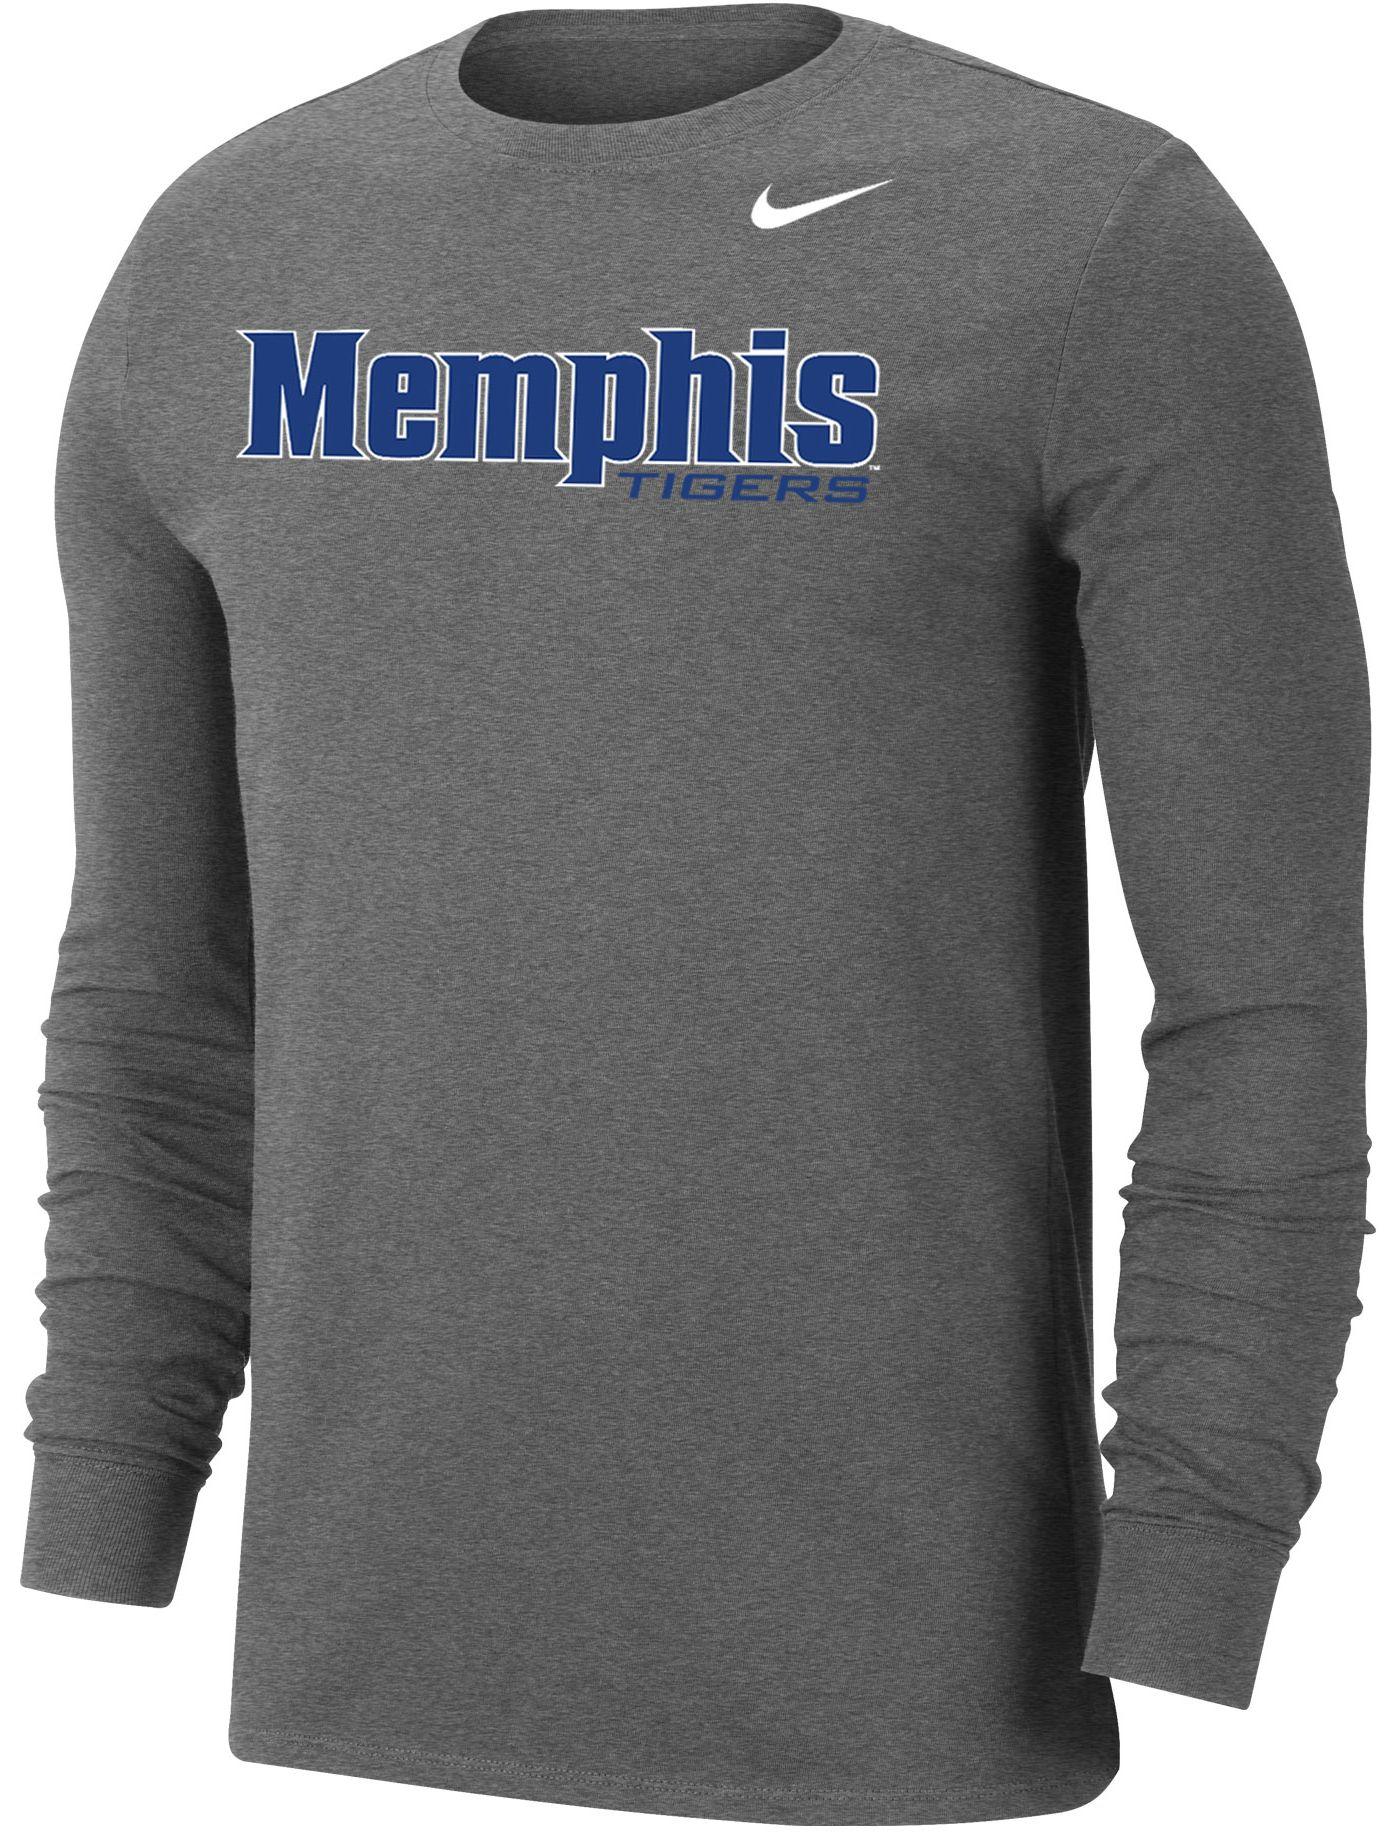 Nike Men's Memphis Tigers Grey Wordmark Long Sleeve T-Shirt